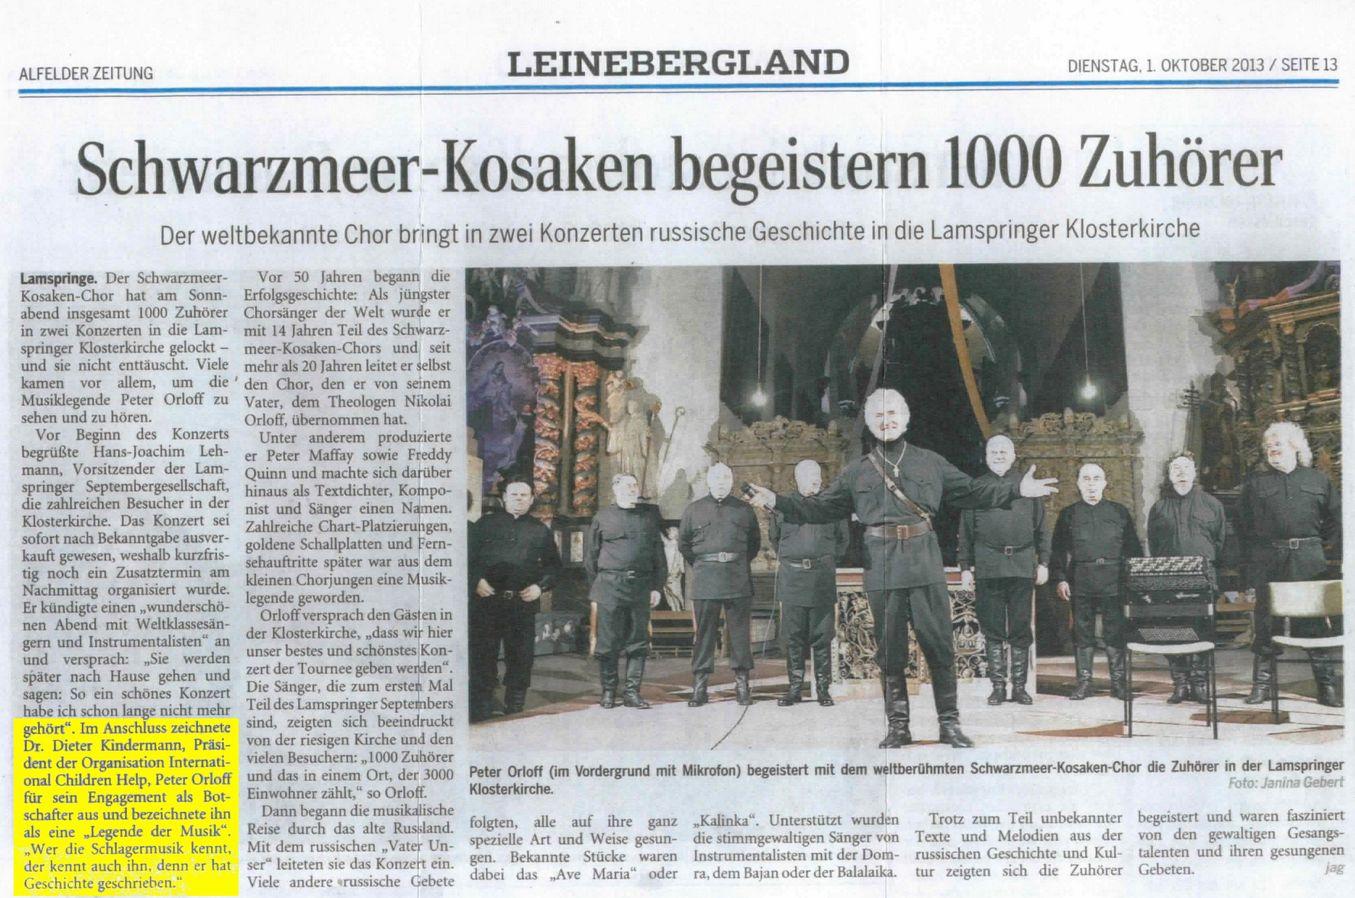 2013-11-05 Peter Orloff begeistert mit dem weltberühmten Schwarzmeer-Kosaken-Chor